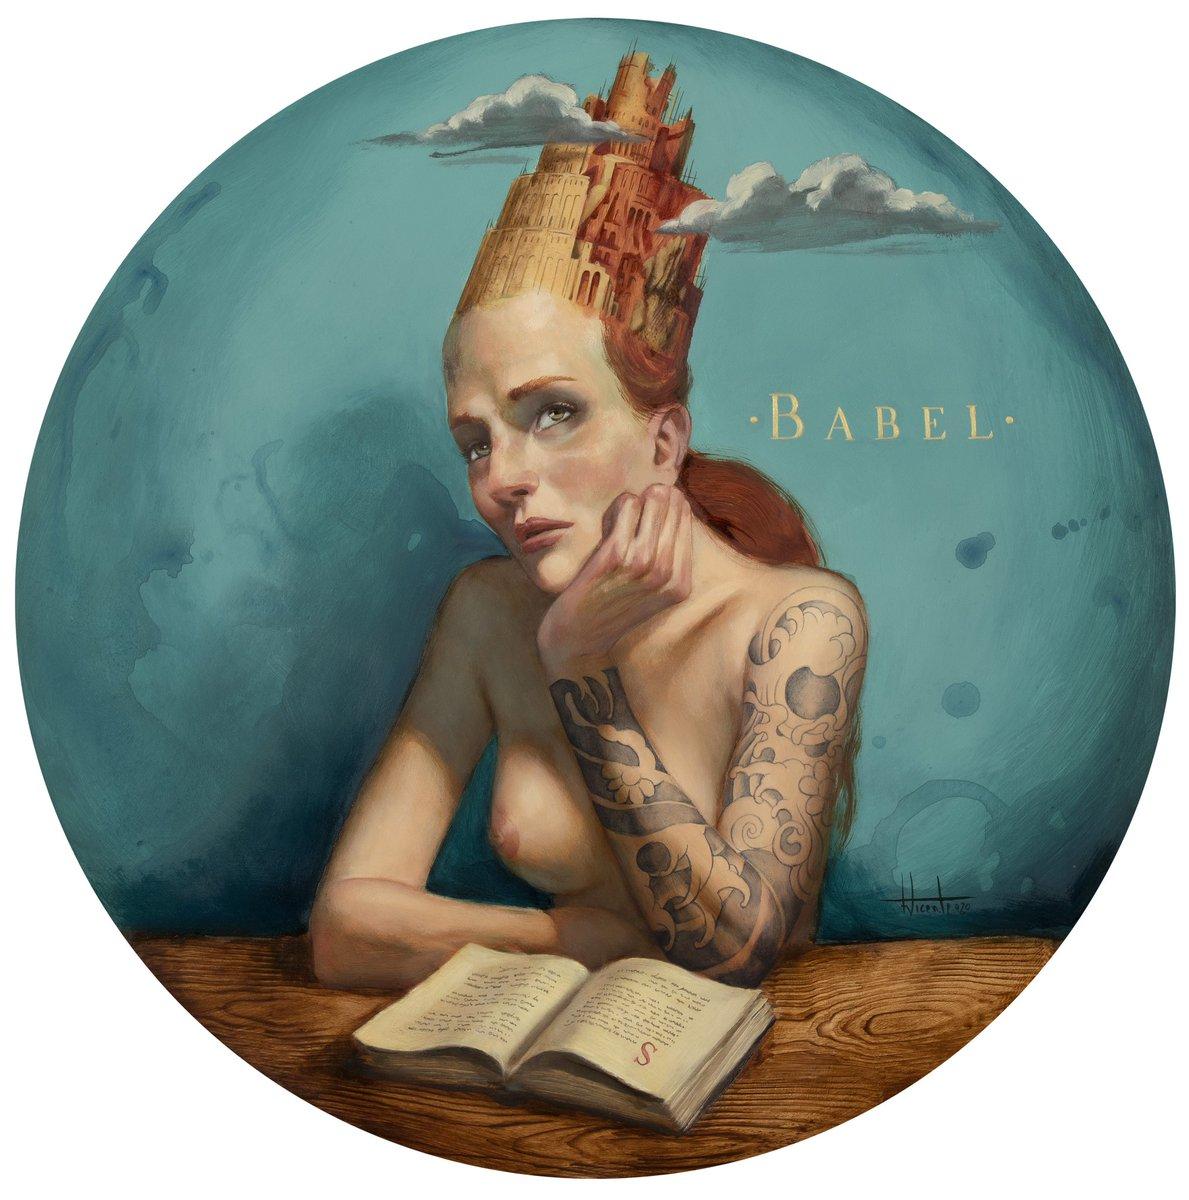 Babel  #babel #tattoo #fernandovicente #torredebabel #oilpainting #oilcanvaspainting https://t.co/oqcuoBQqOK